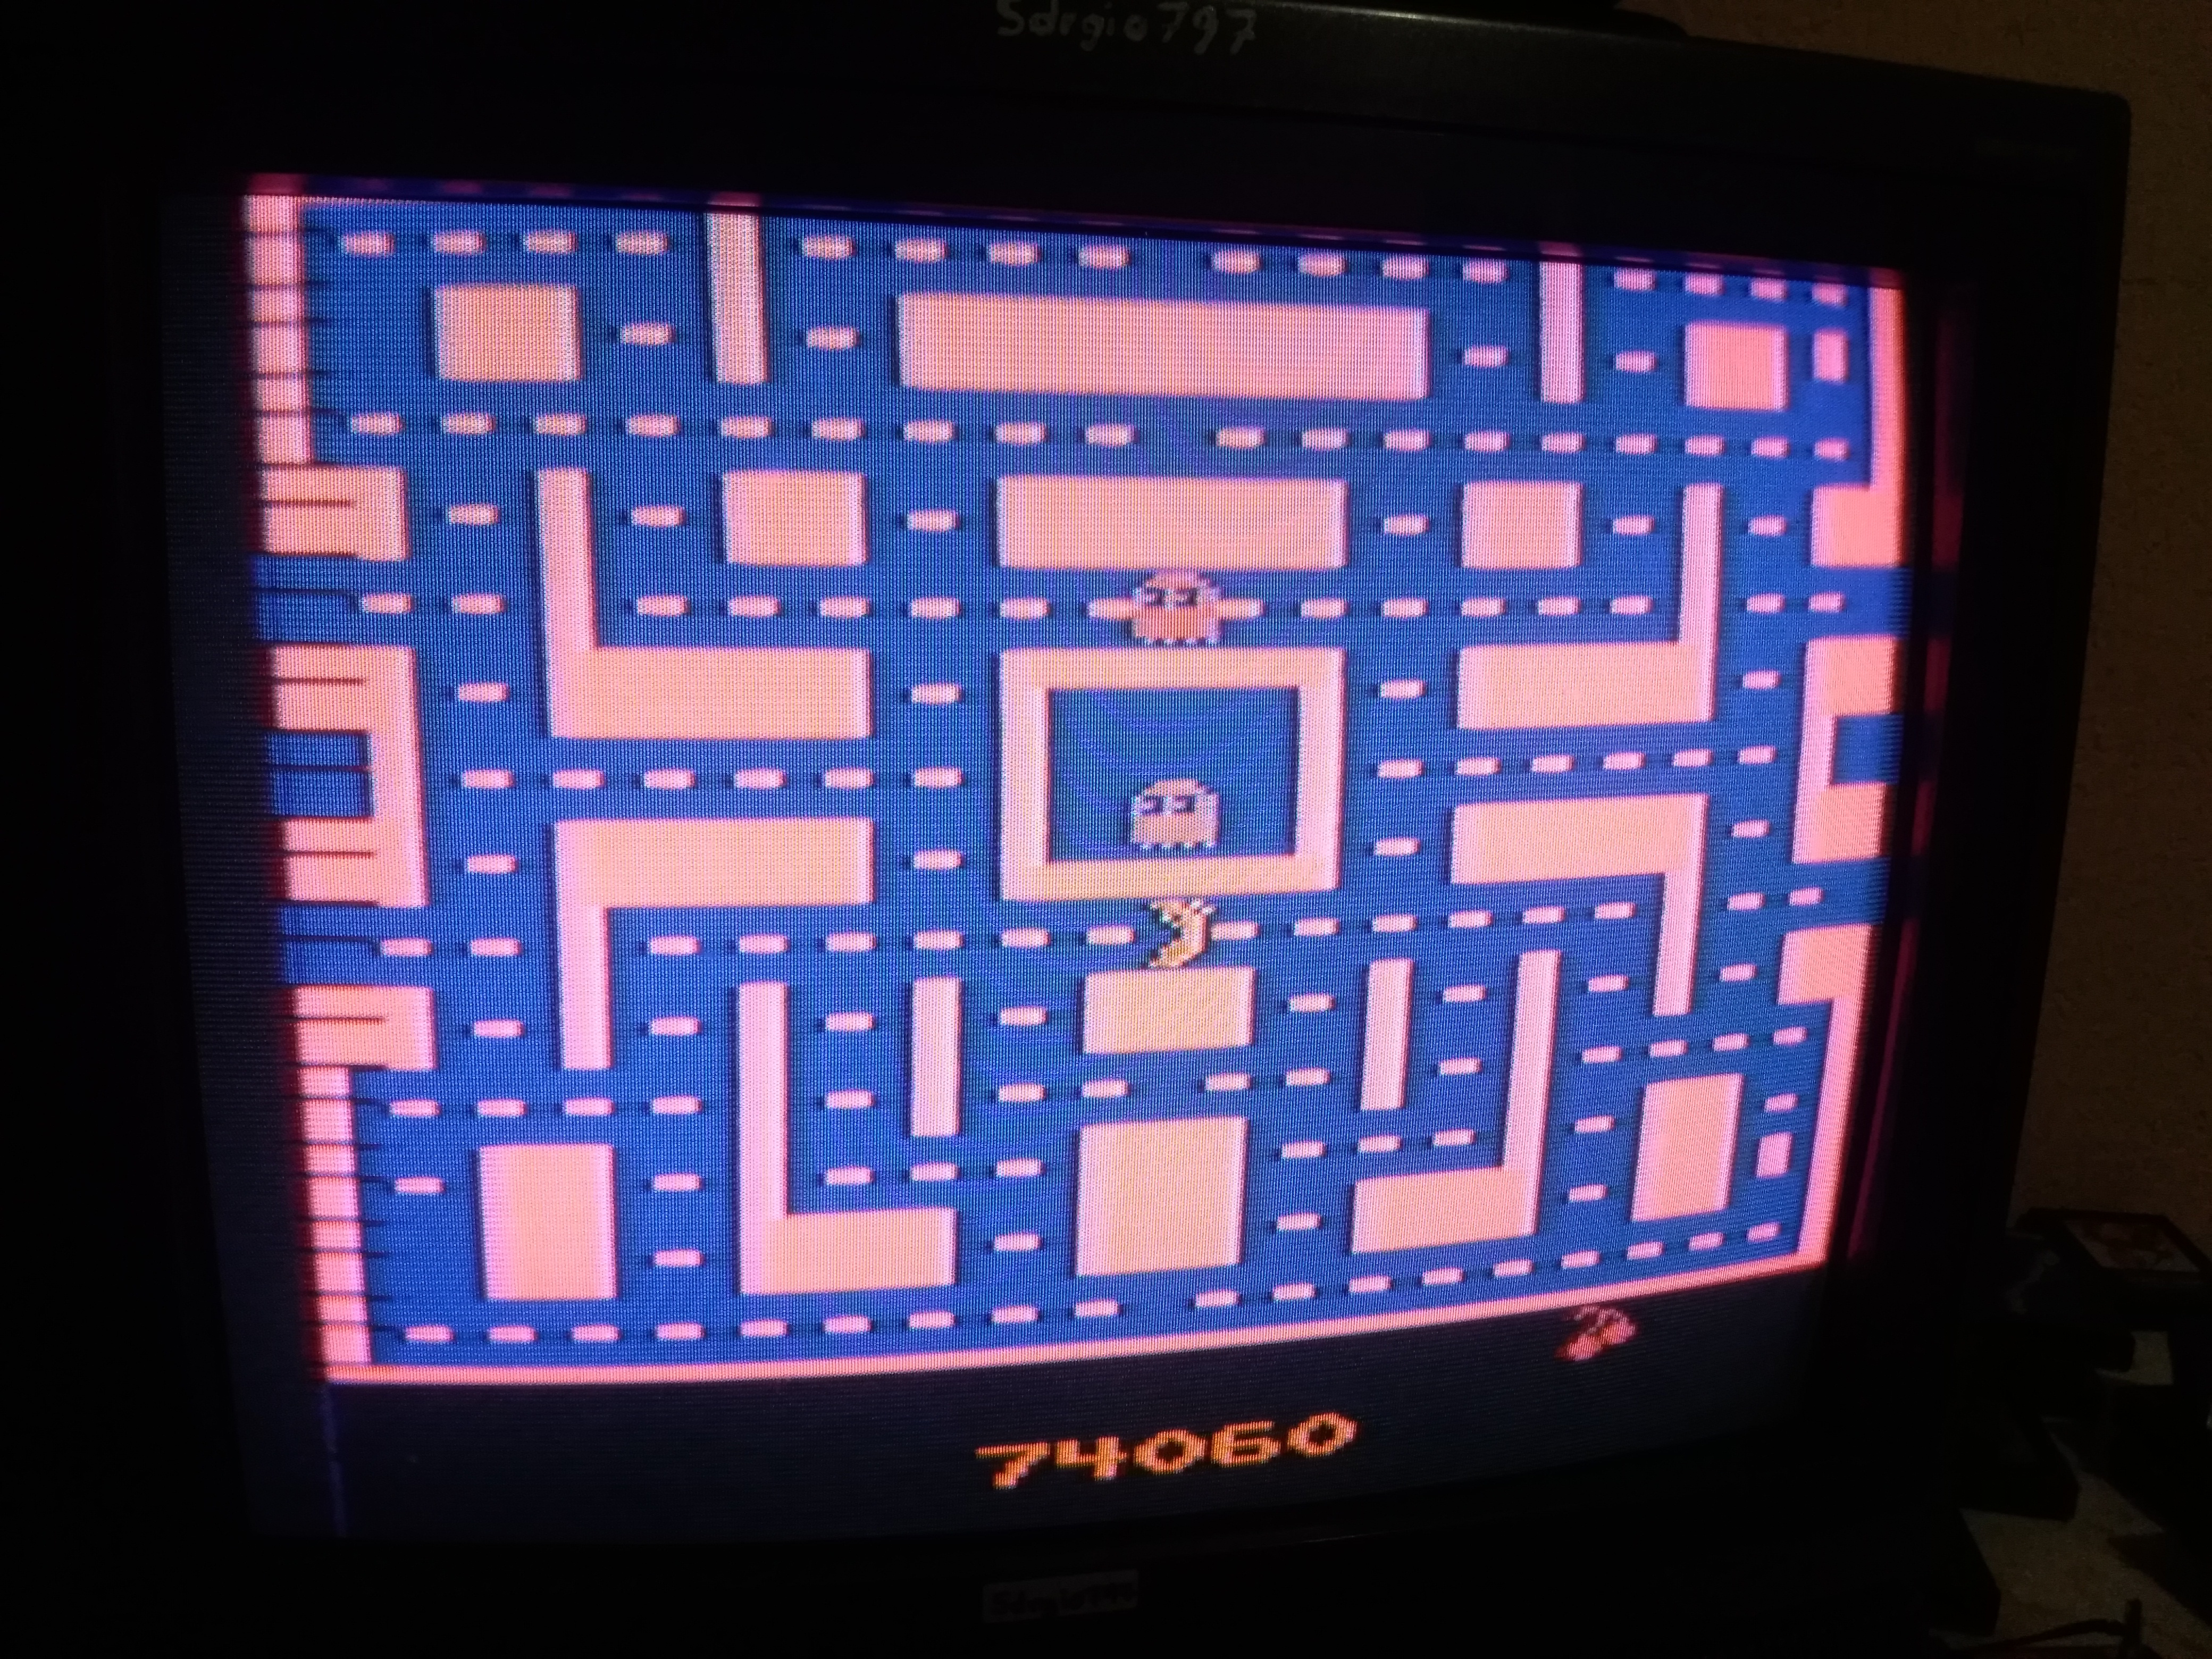 Sdrgio797: Ms. Pac-Man (Atari 2600) 74,060 points on 2020-06-26 23:55:12